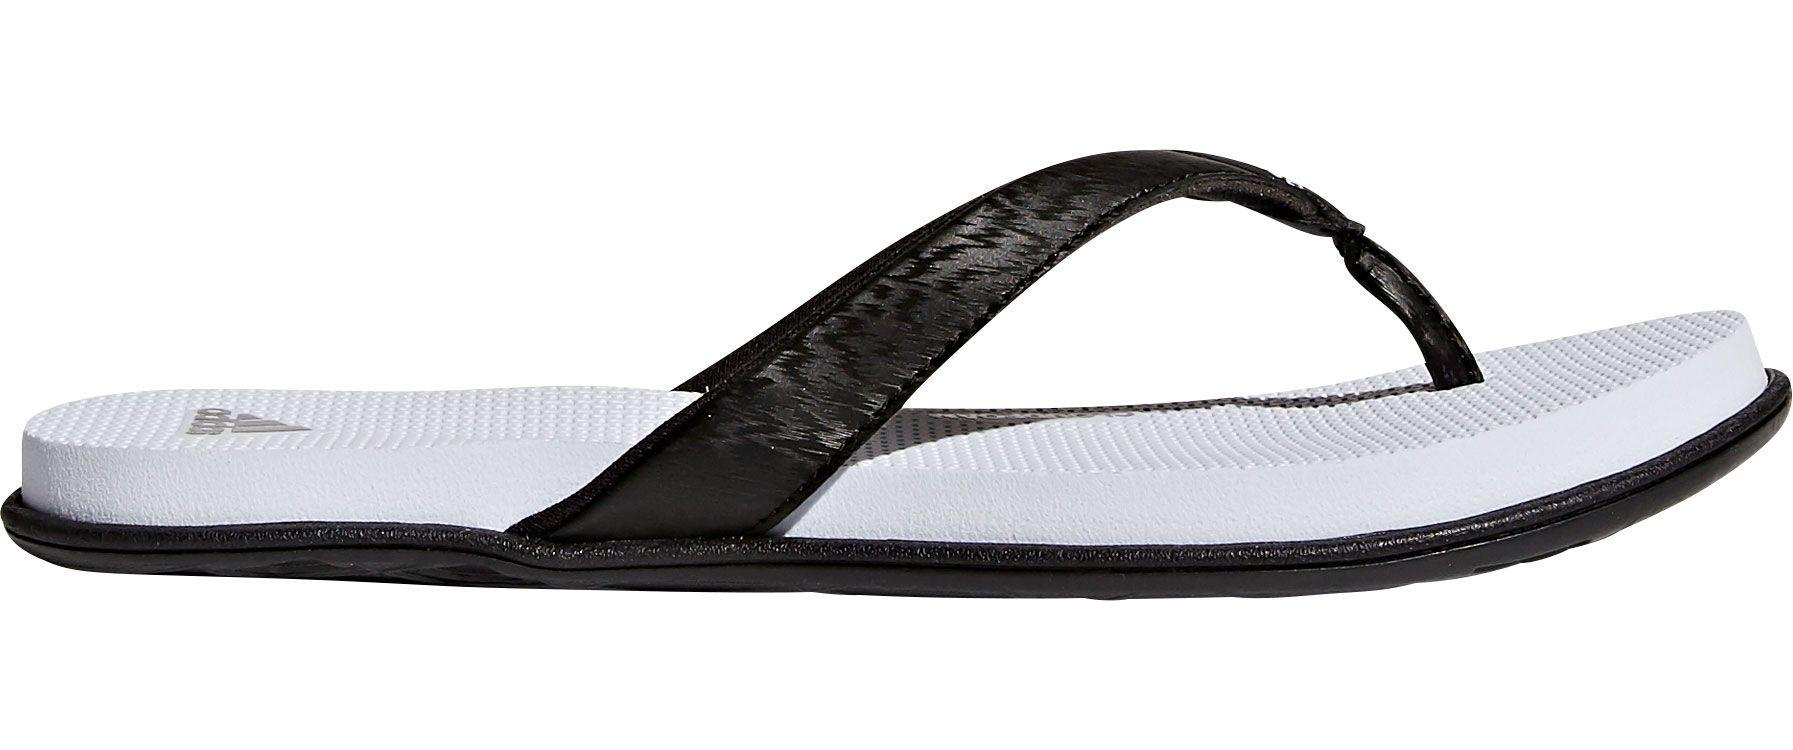 e655b41ce07395 Lyst - adidas Cloudfoam One Thong Sandals in Black